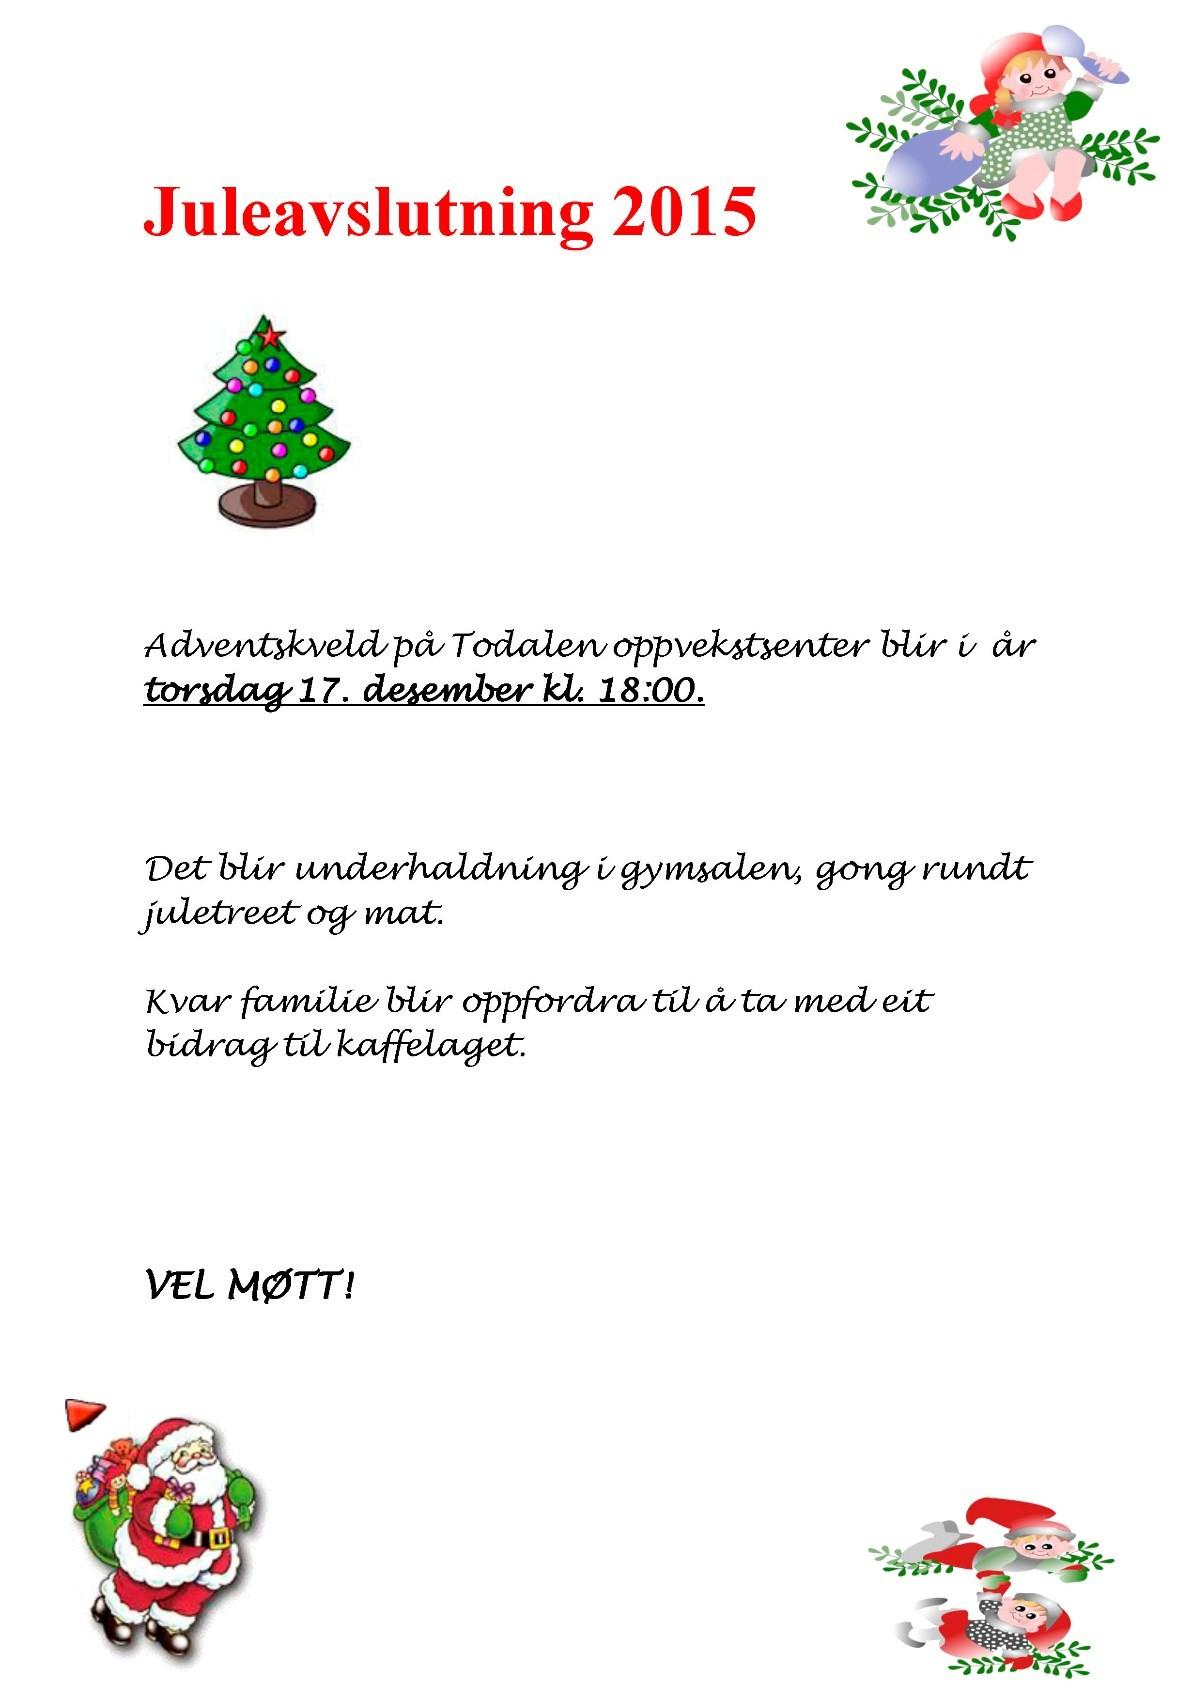 Plakat Juleavslutning 2015